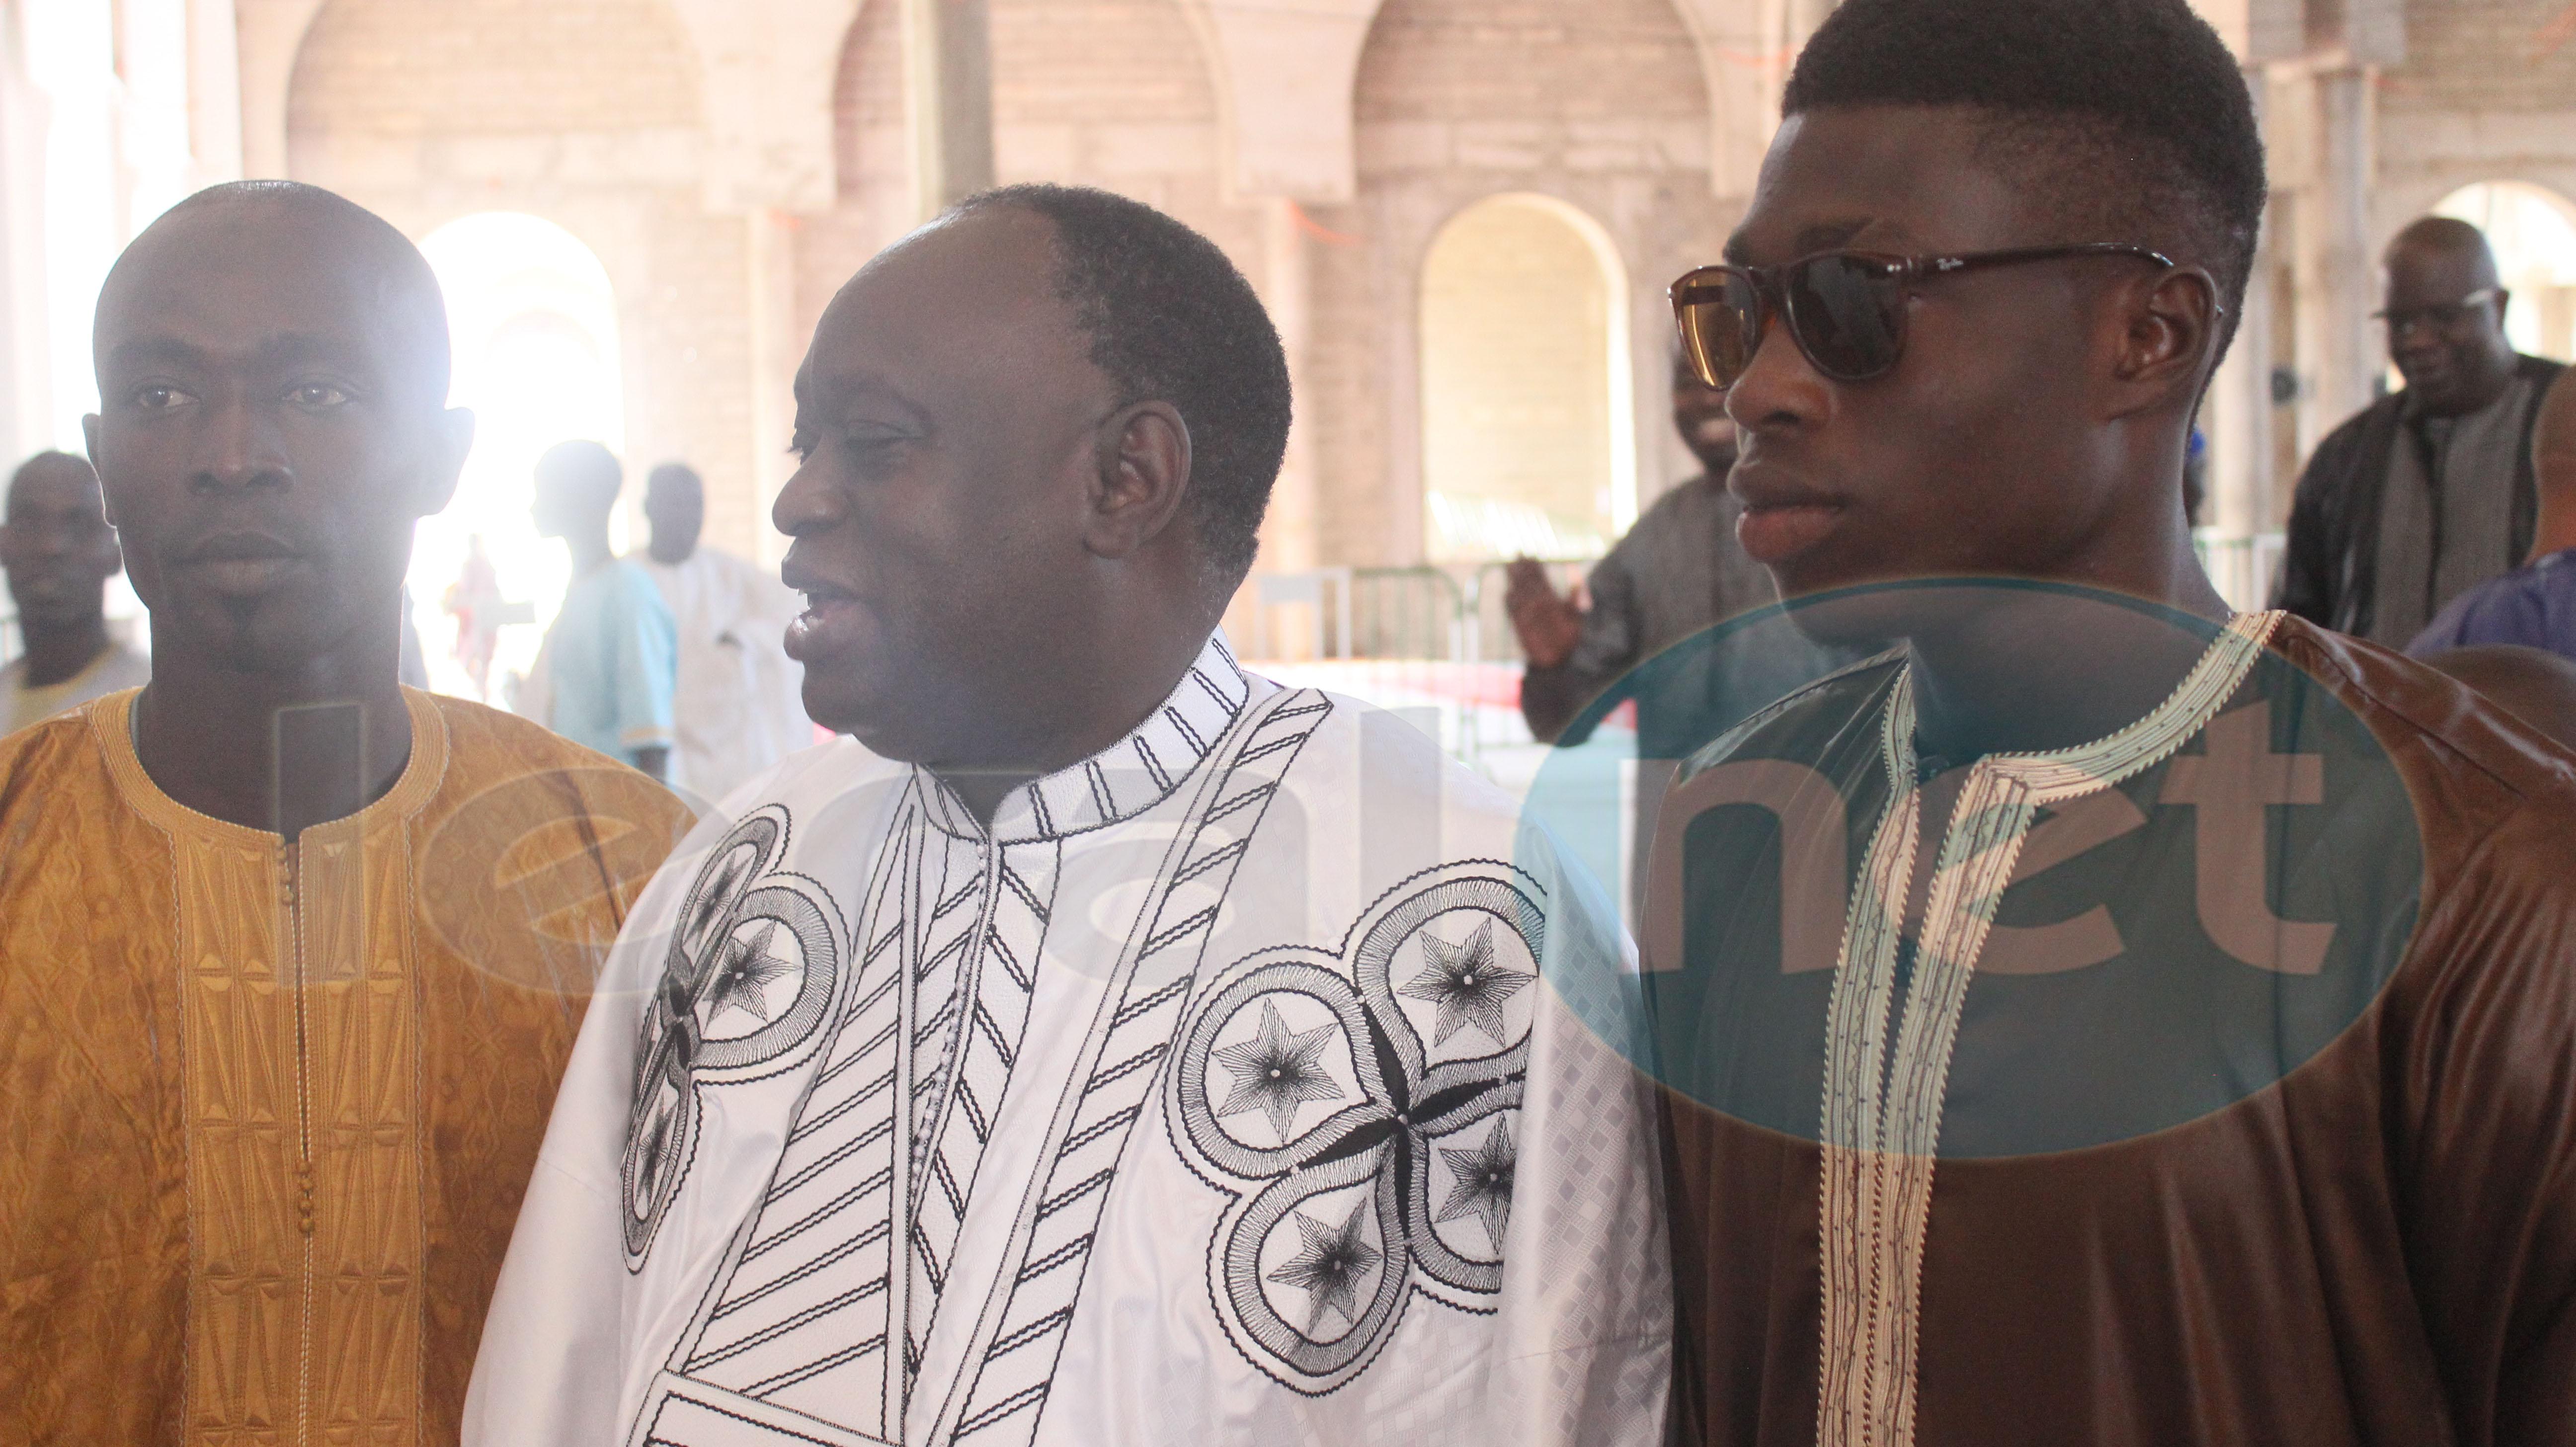 TABASKI: 2016, Me El hadji Diouf à Massalikoul djinane